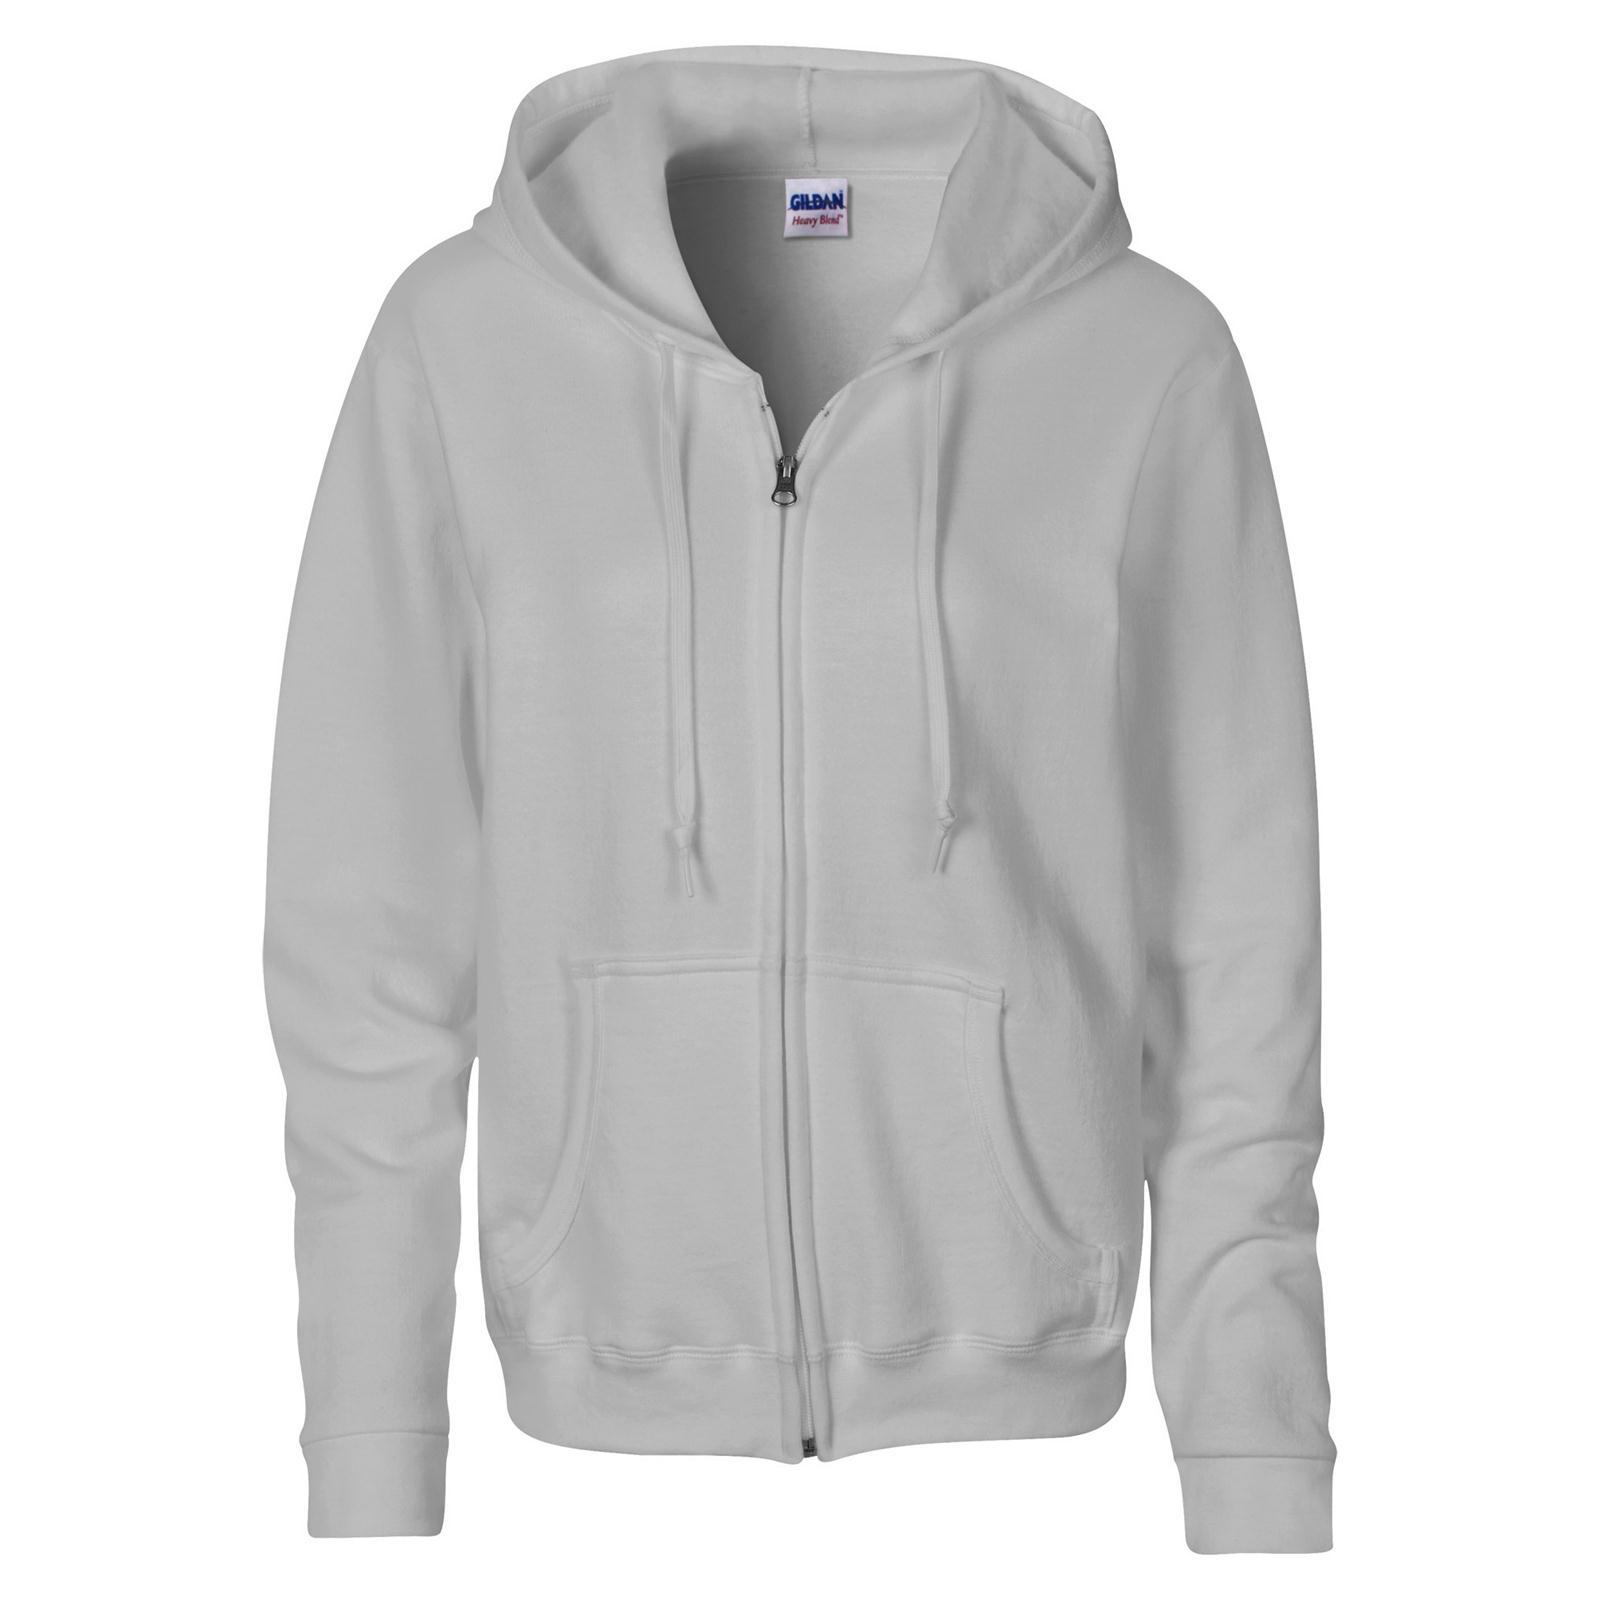 new gildan womens ladies heavy full zip up hoodie sweatshirt in 6 colours s